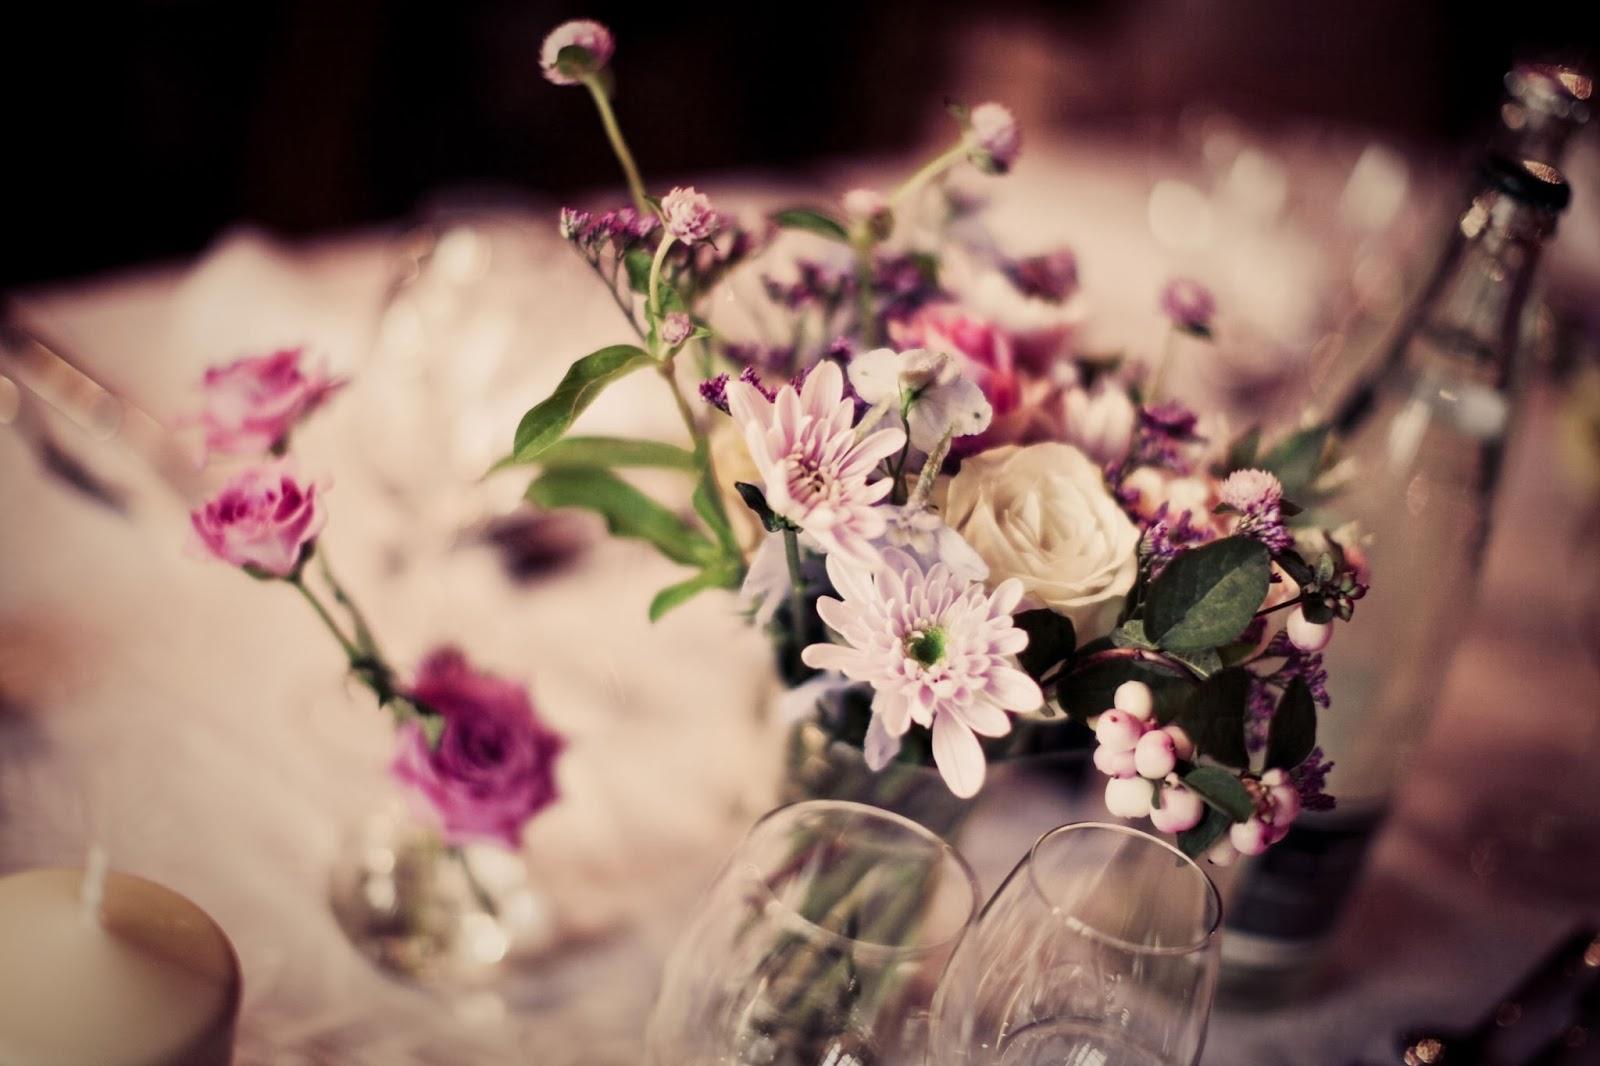 Floral decoration on a wedding table - wedding photographer : Elisabeth Perotin